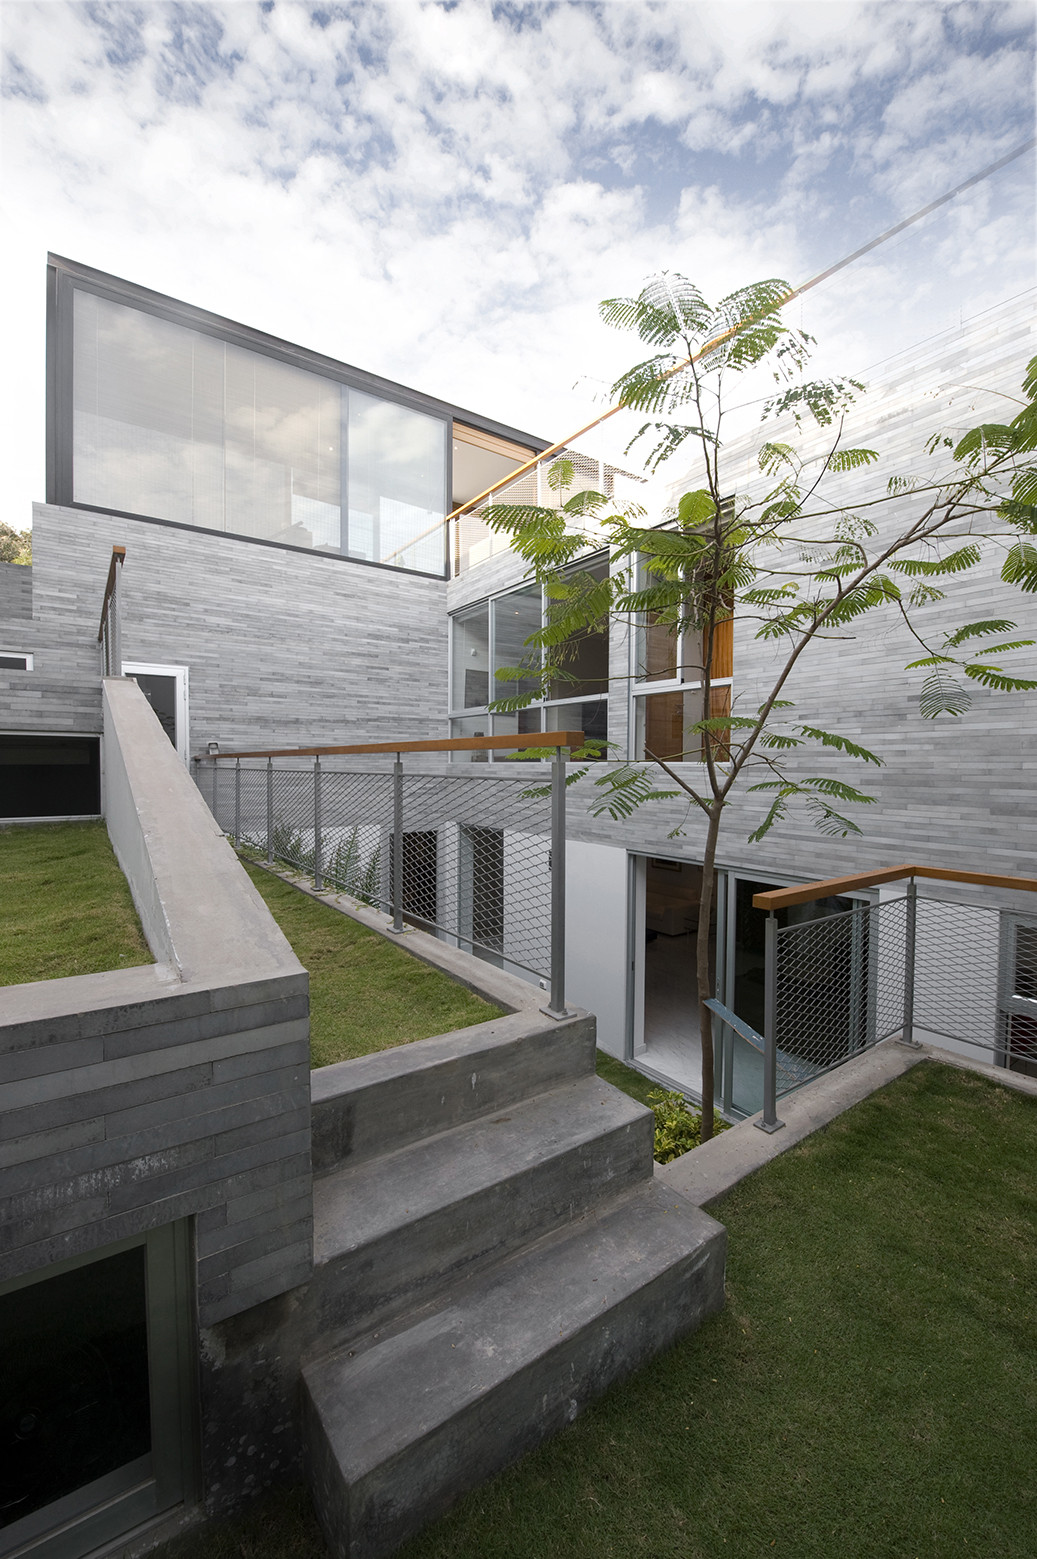 Spiral garden house 51 1 arquitectos archdaily for Casa infantil jardin